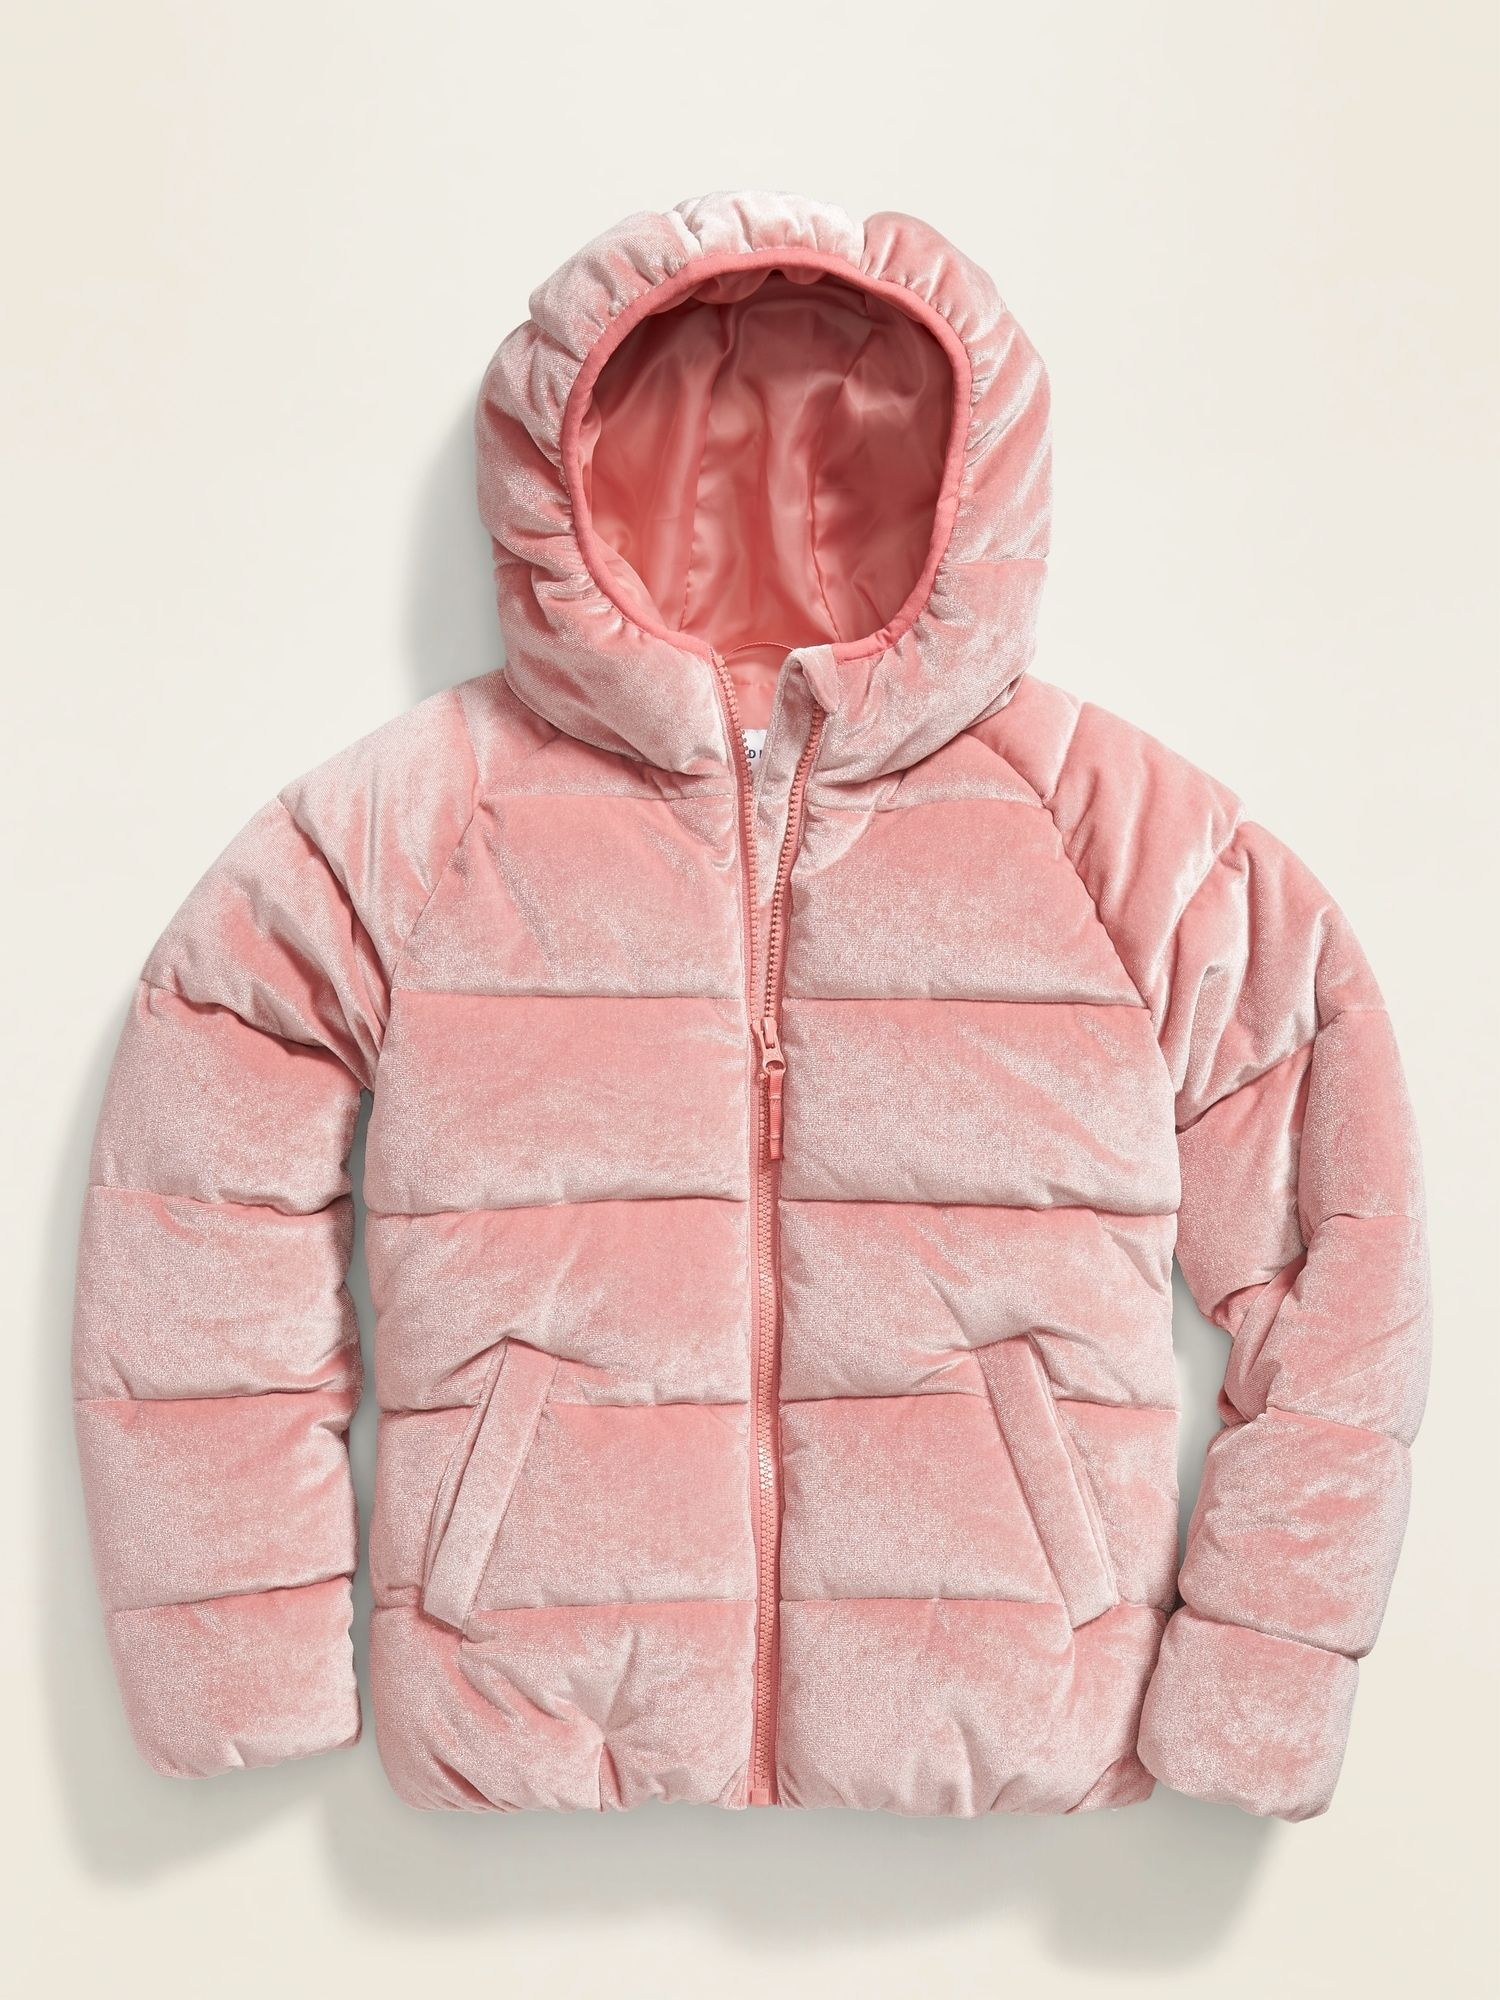 Velvet Puffer Jacket For Girls Girls Jacket Jackets Old Navy Girls [ 2000 x 1500 Pixel ]